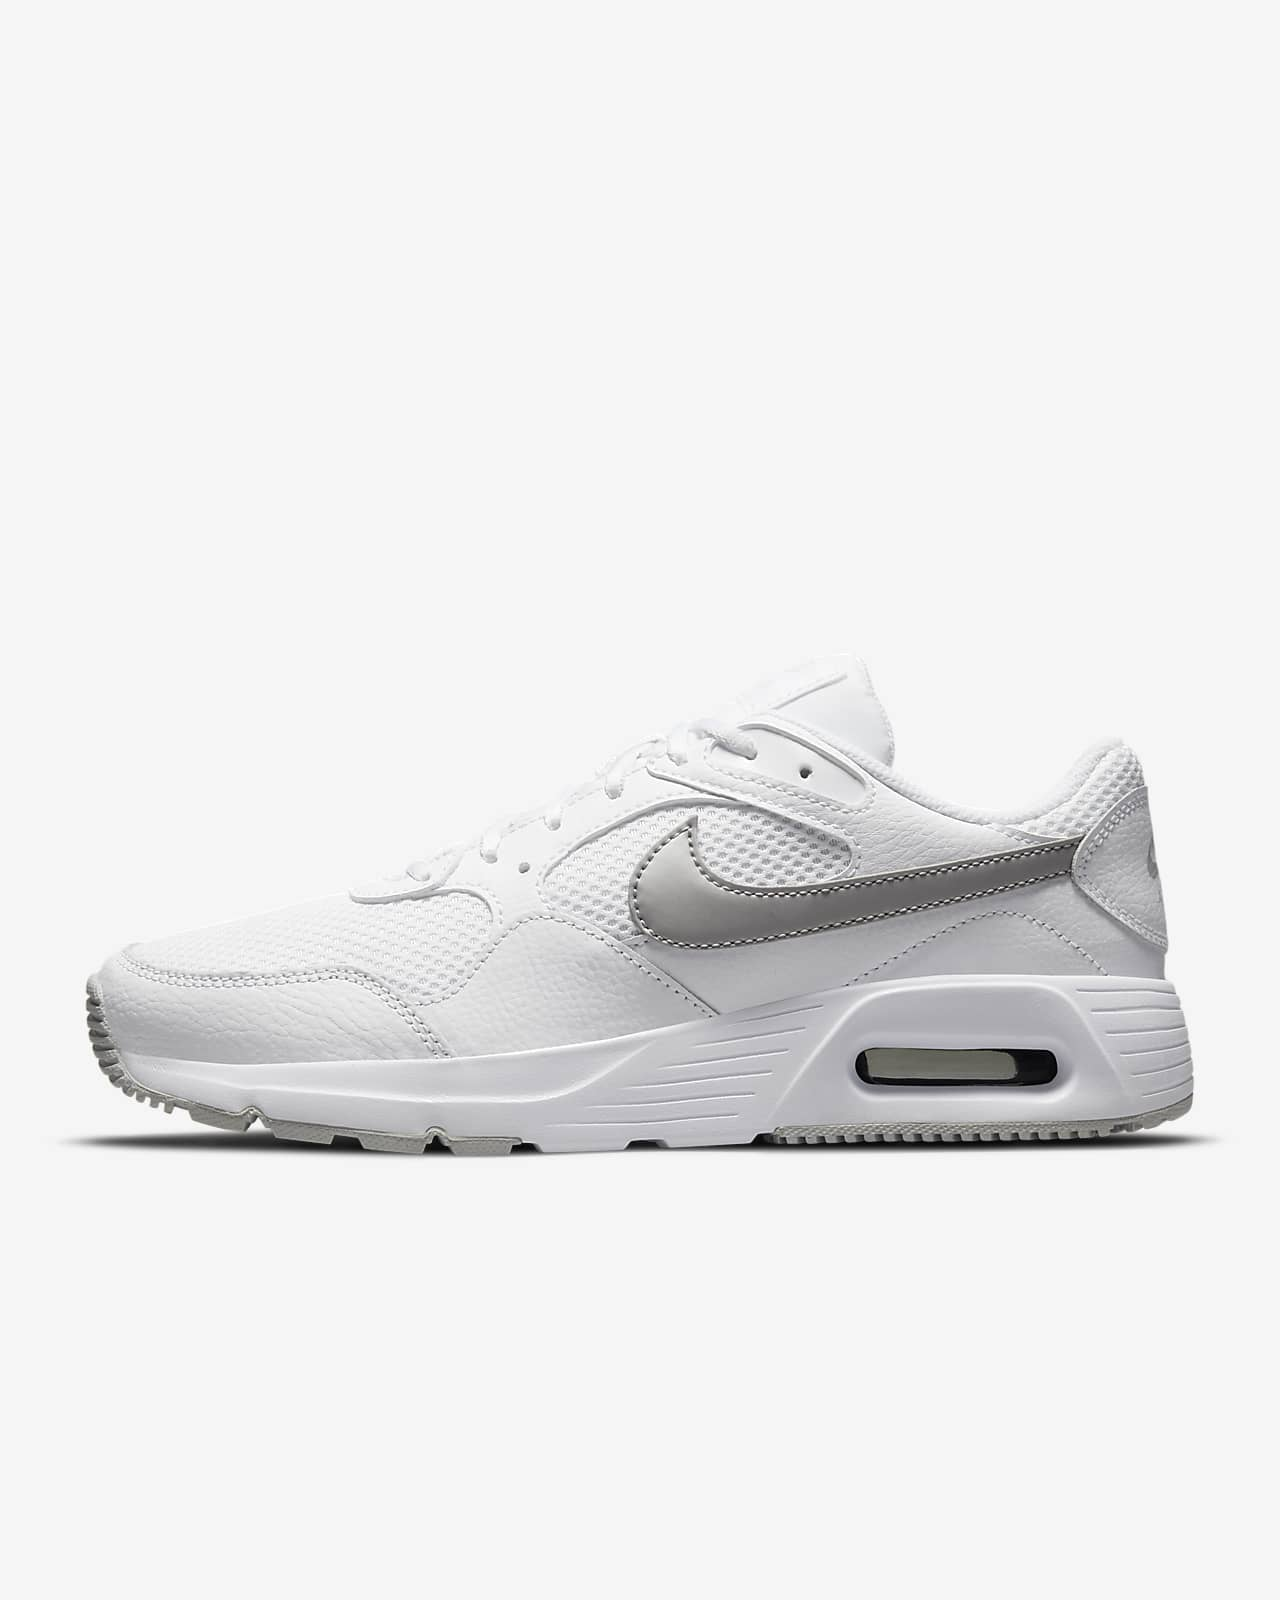 Nike Air Max SC Women's Shoes